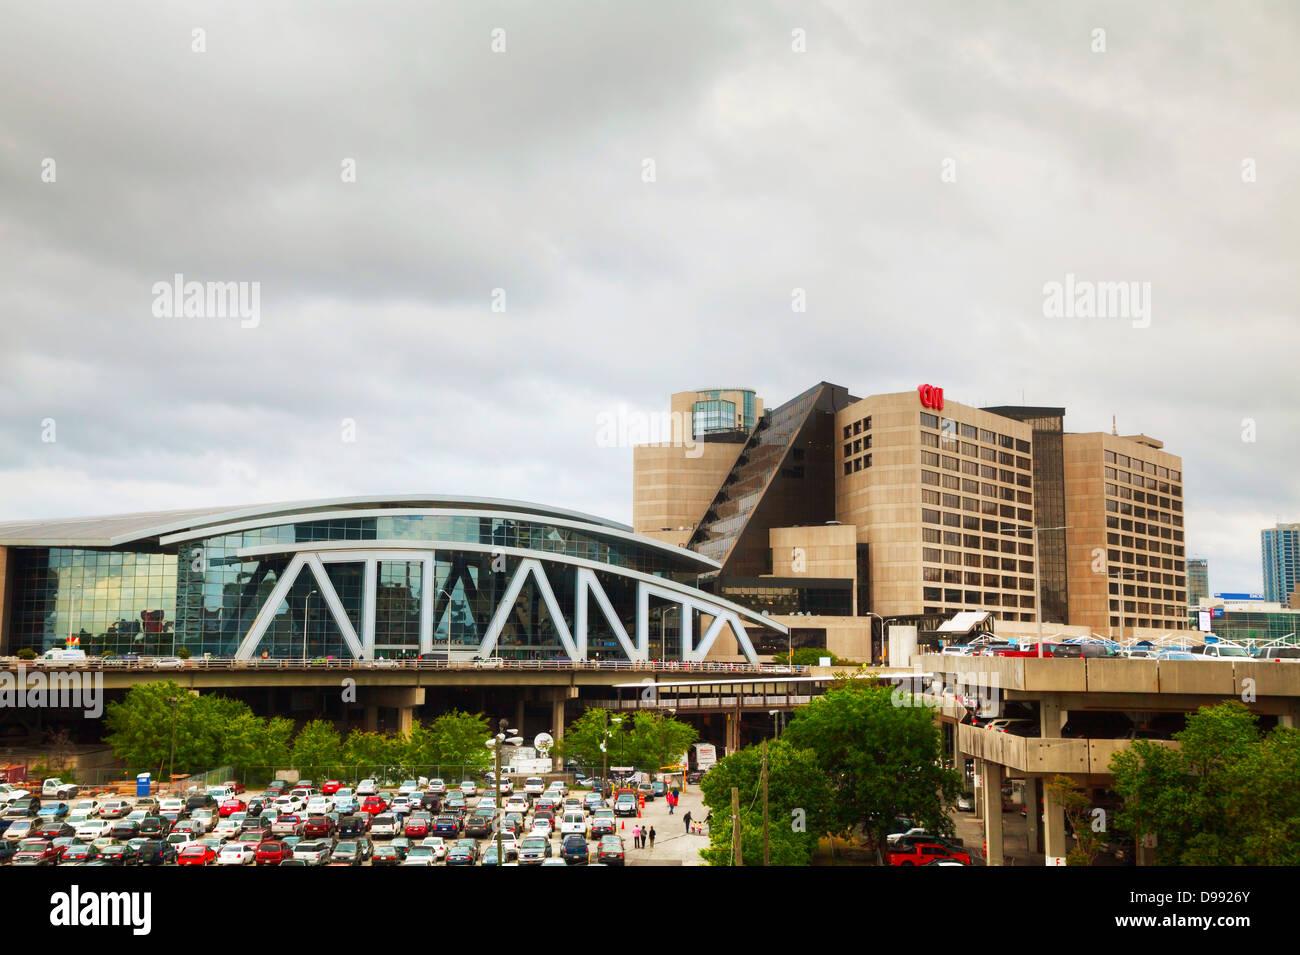 Philips Arena and CNN Center in Atlanta - Stock Image